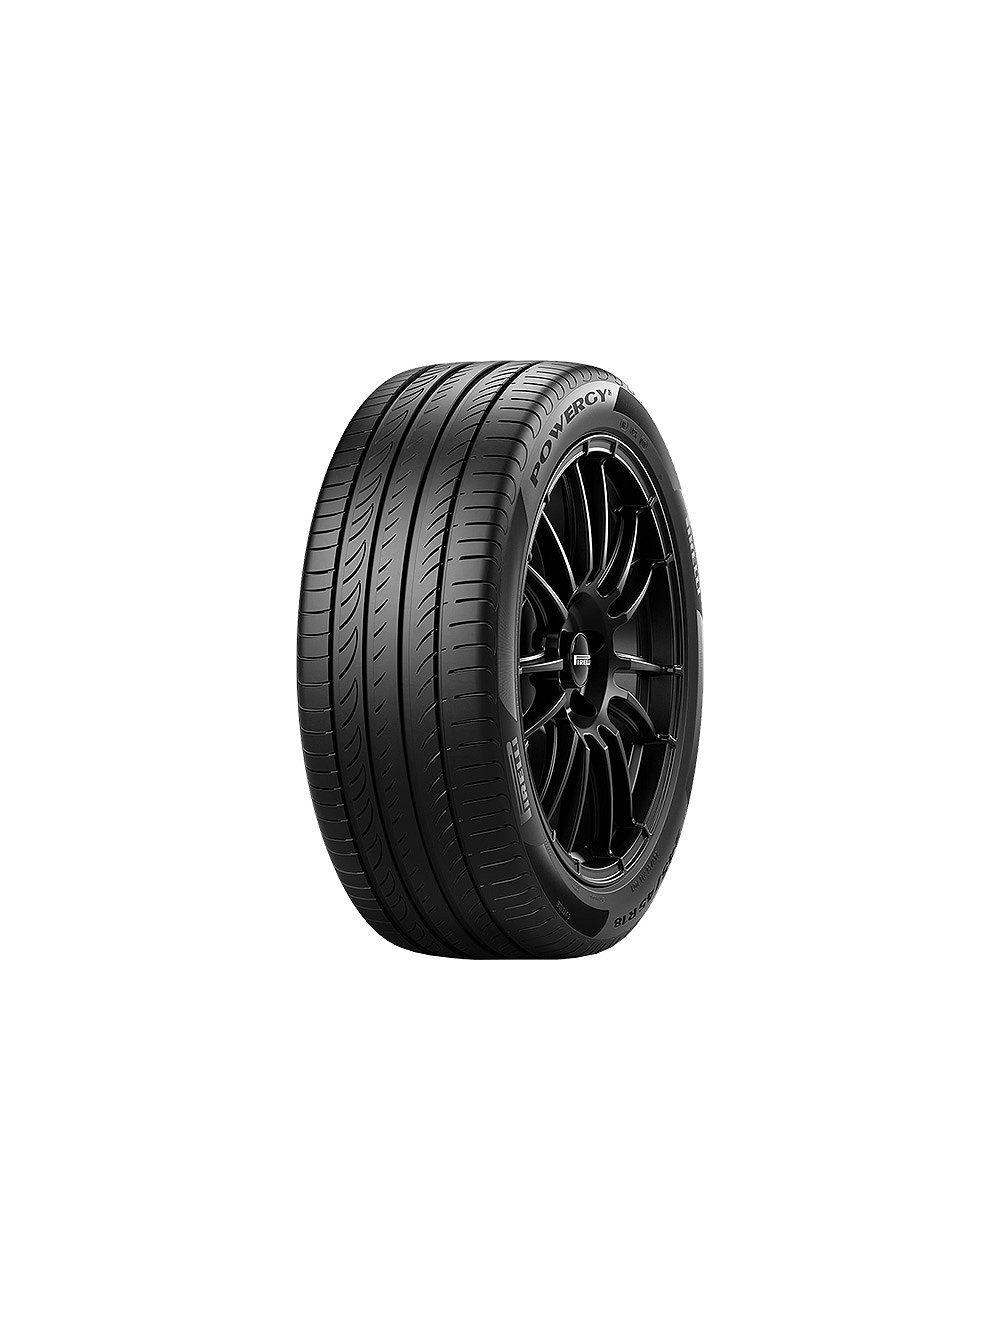 Pirelli 225/35R19 Y Powergy XL Nyári gumi